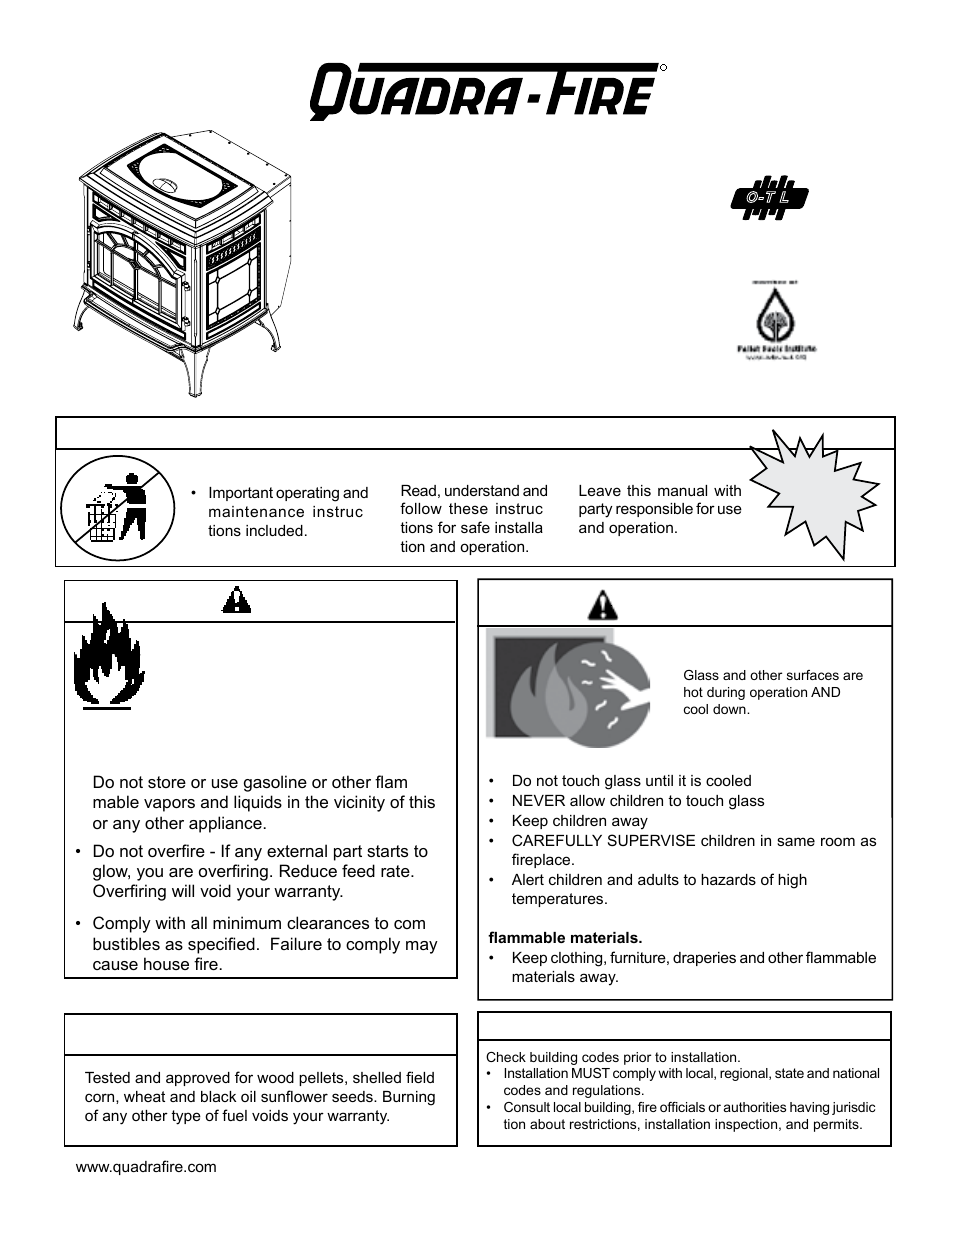 quadra fire mtvernon ae mbk user manual 56 pages. Black Bedroom Furniture Sets. Home Design Ideas